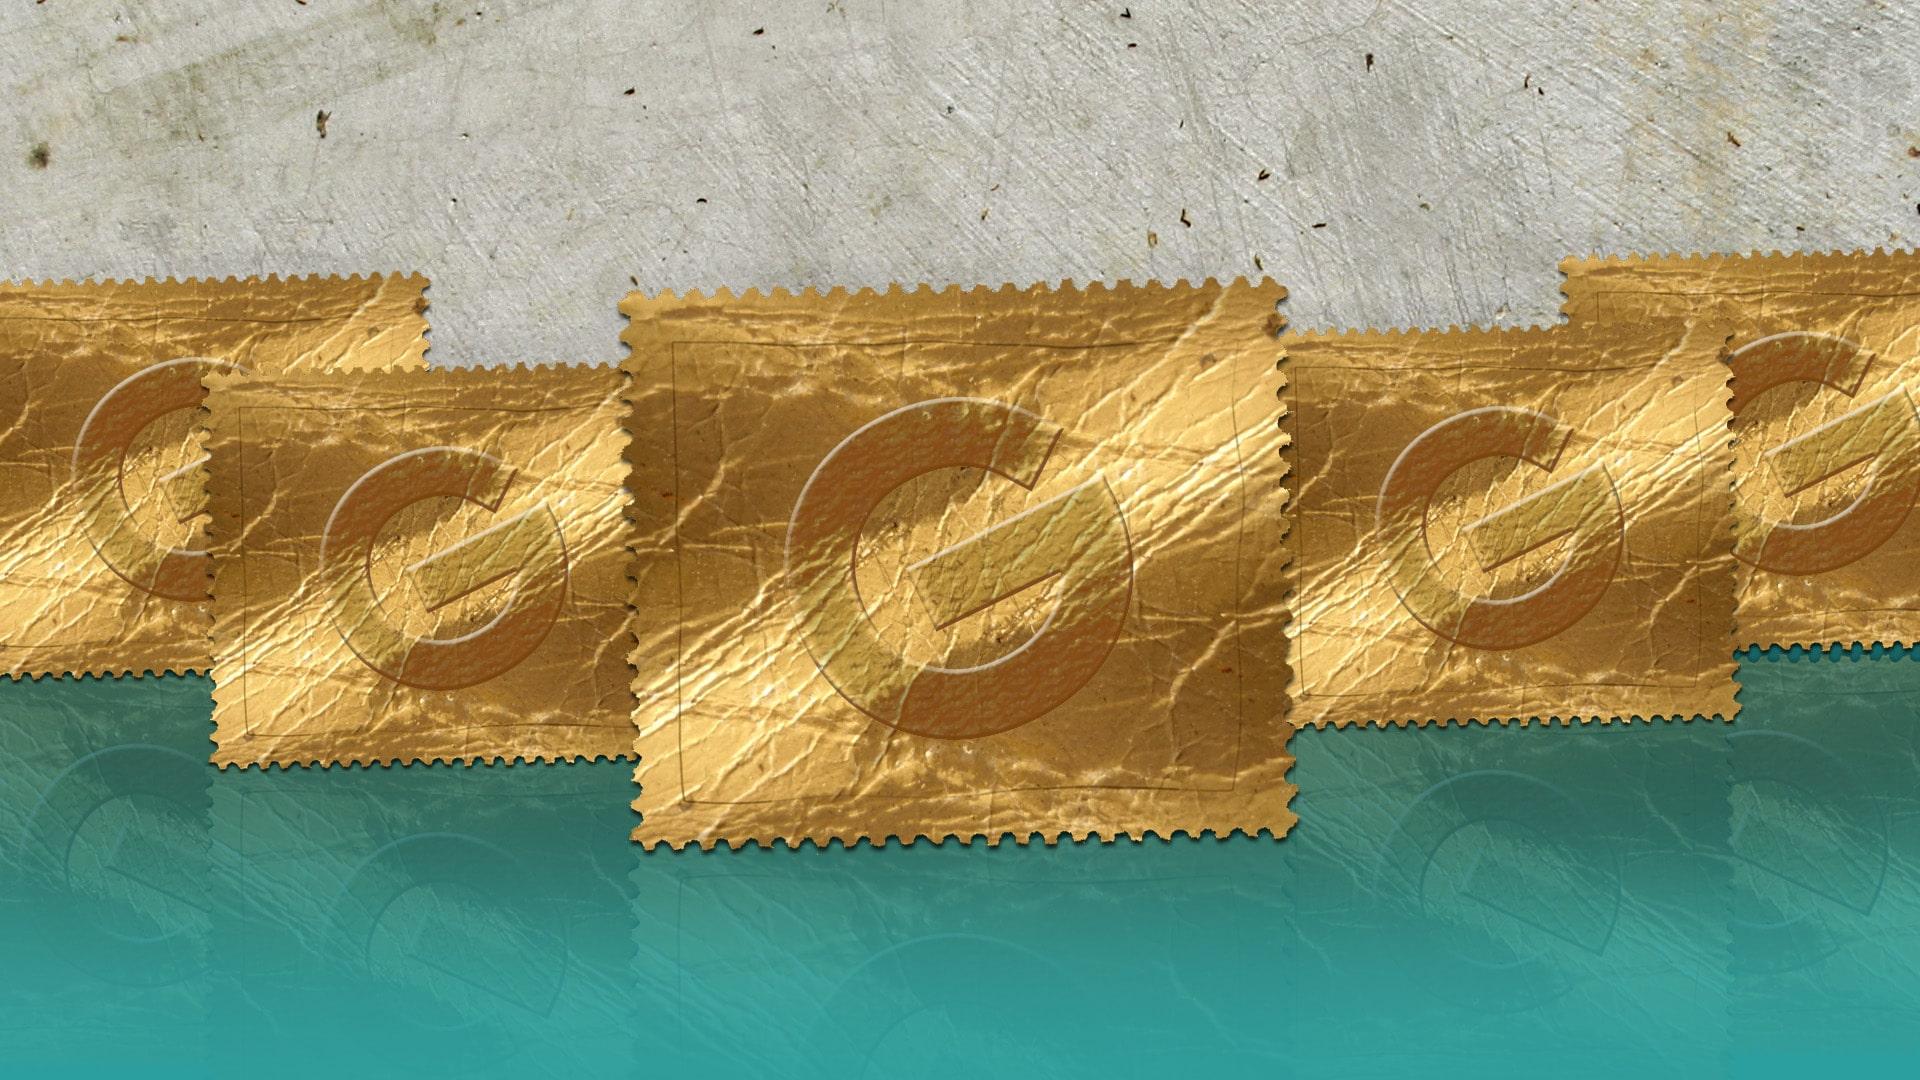 Goldmarke, Silvia Goldhammer, beziehungskis.de, Logo, StartUp, Existenzgründer, Design, Grafik, Werbeagentur, Nürnberg